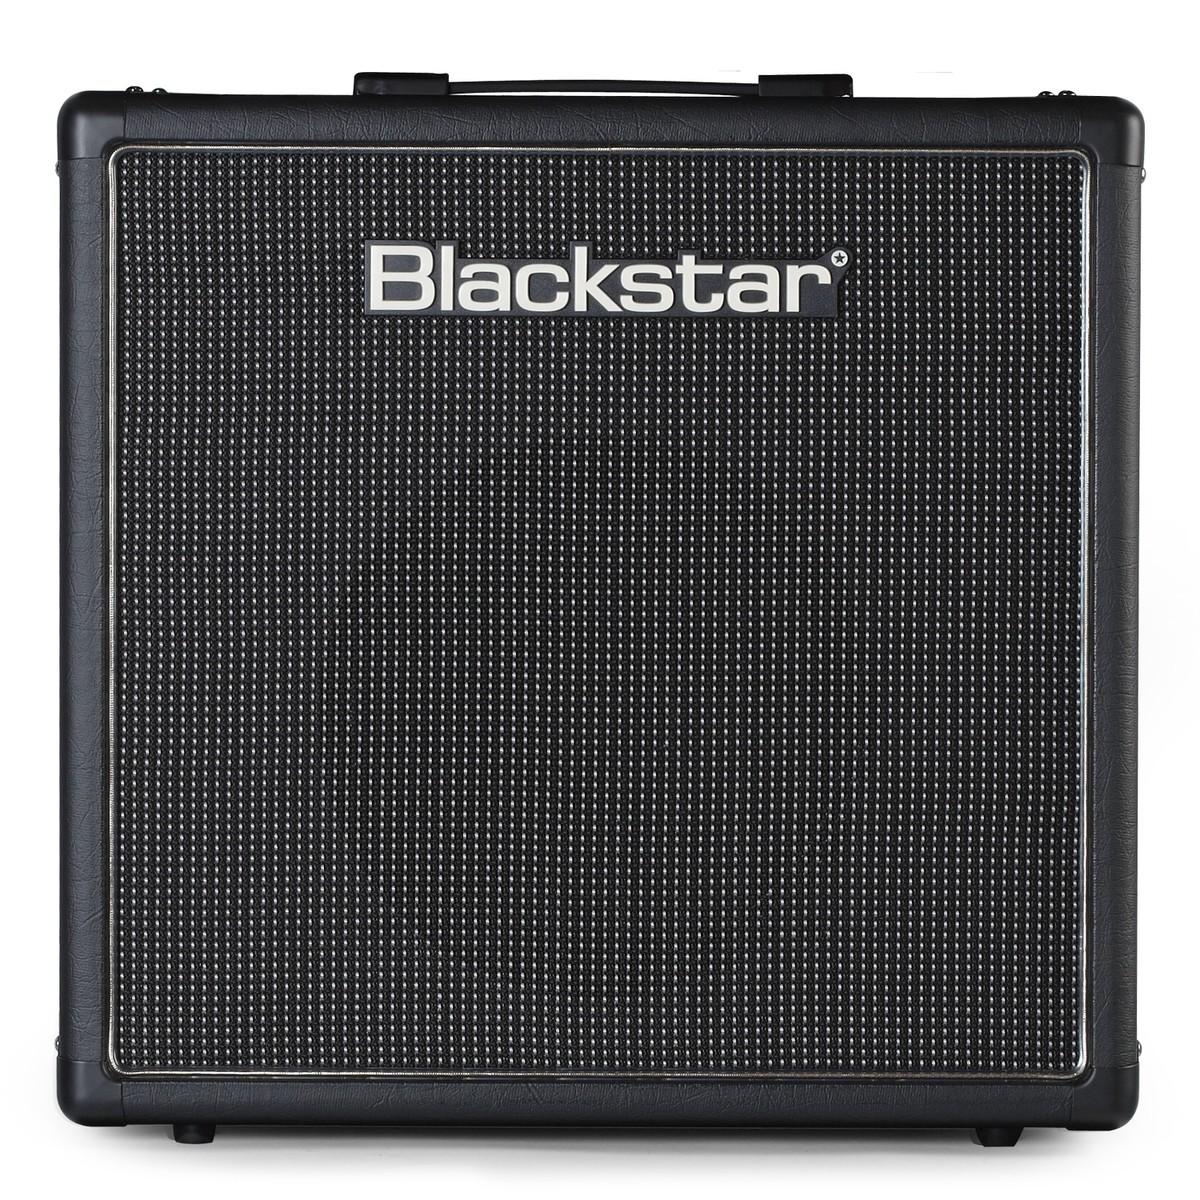 Blackstar 1x12 Cab : blackstar ht 112 1x12 speaker cabinet gear4music ~ Vivirlamusica.com Haus und Dekorationen